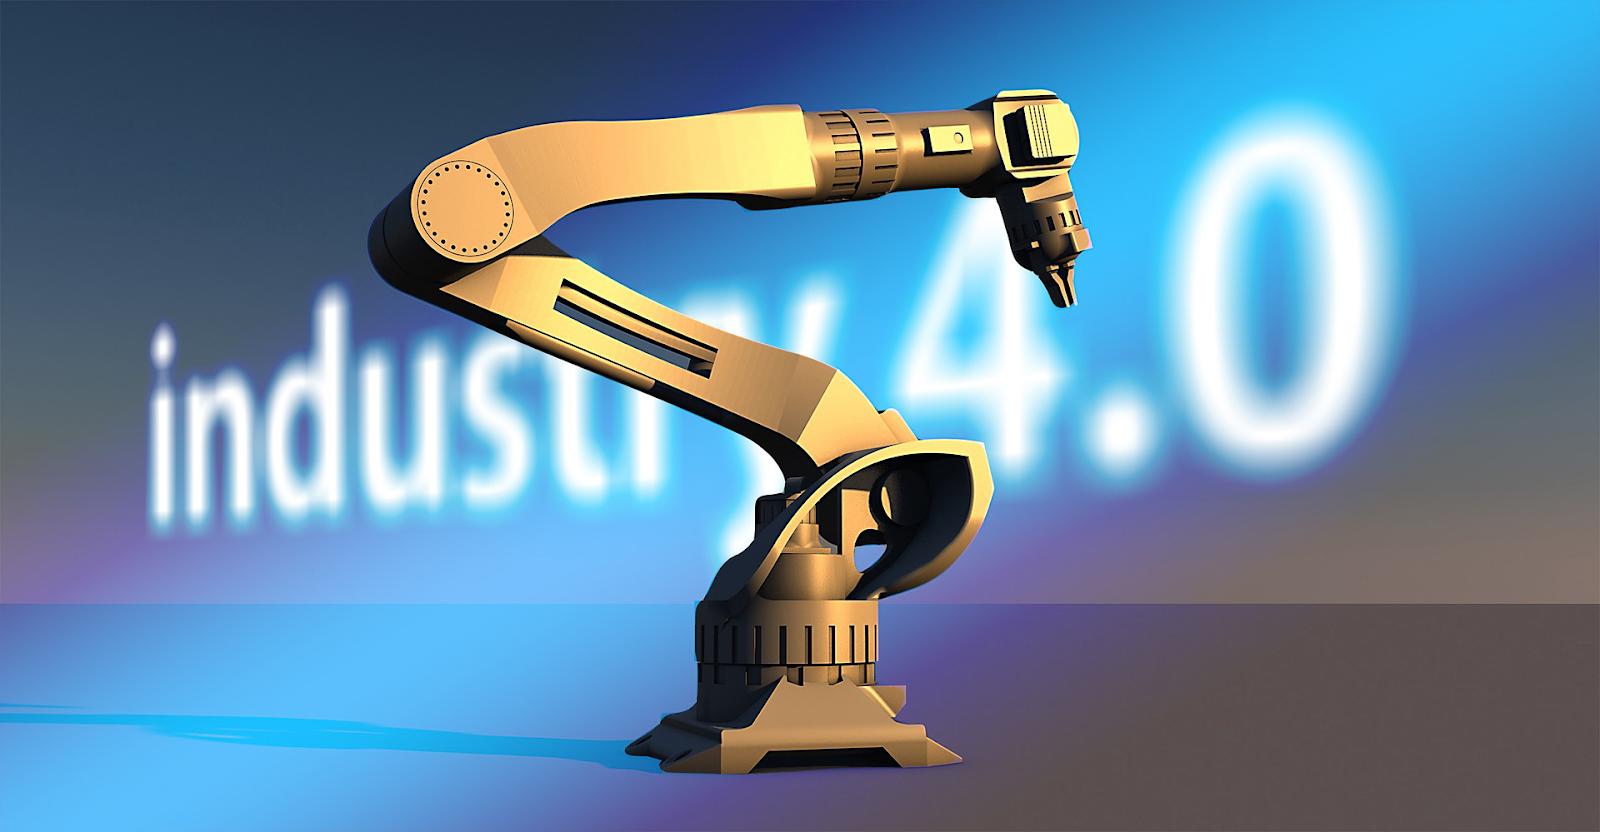 Industrial Application of IoT Development